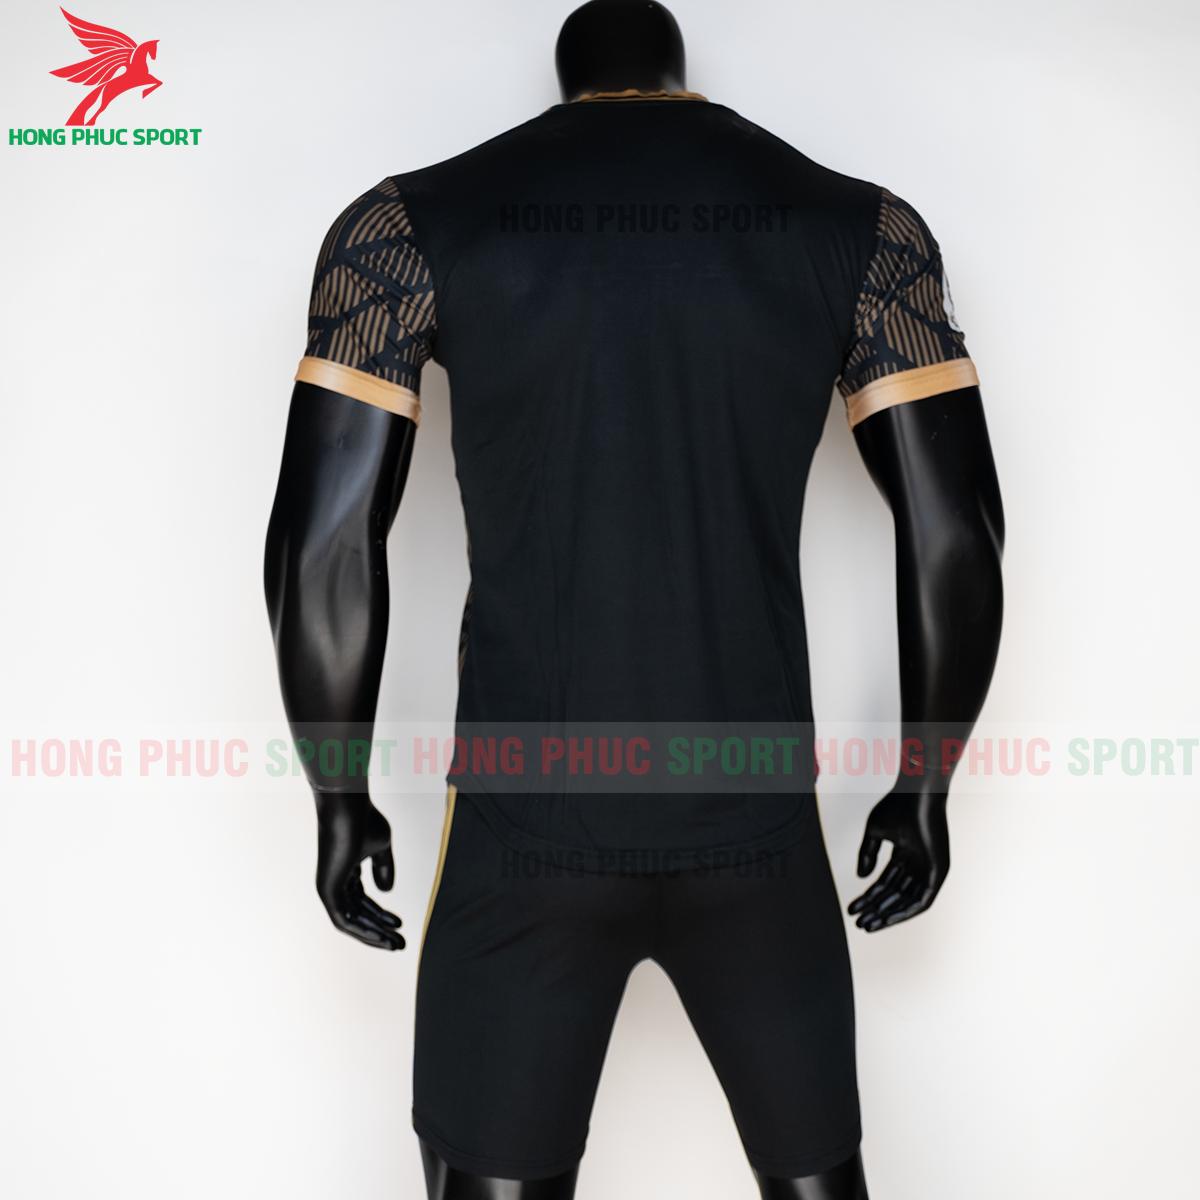 https://cdn.hongphucsport.com/unsafe/s4.shopbay.vn/files/285/ao-real-madrid-2020-phien-ban-fan-mau3-7-5f72fa6a32afc.png